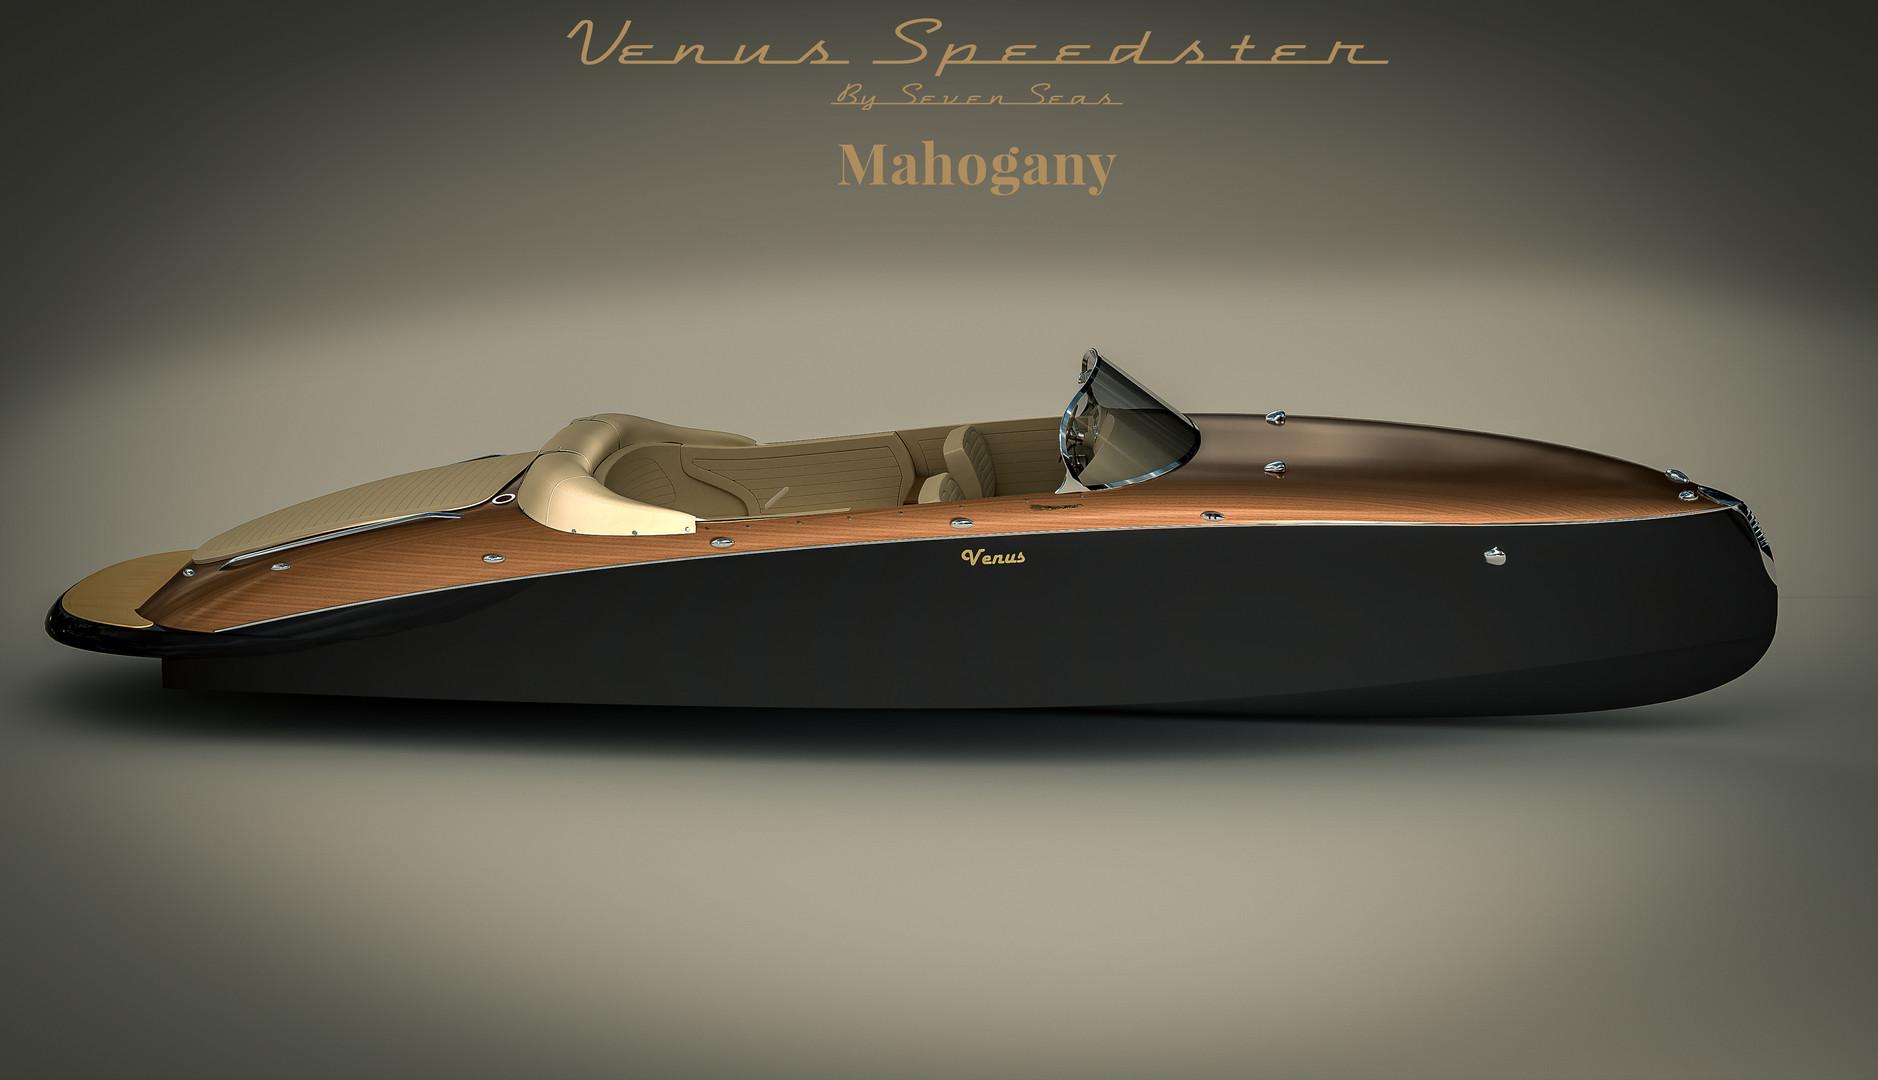 Venus Speedster Mahogany